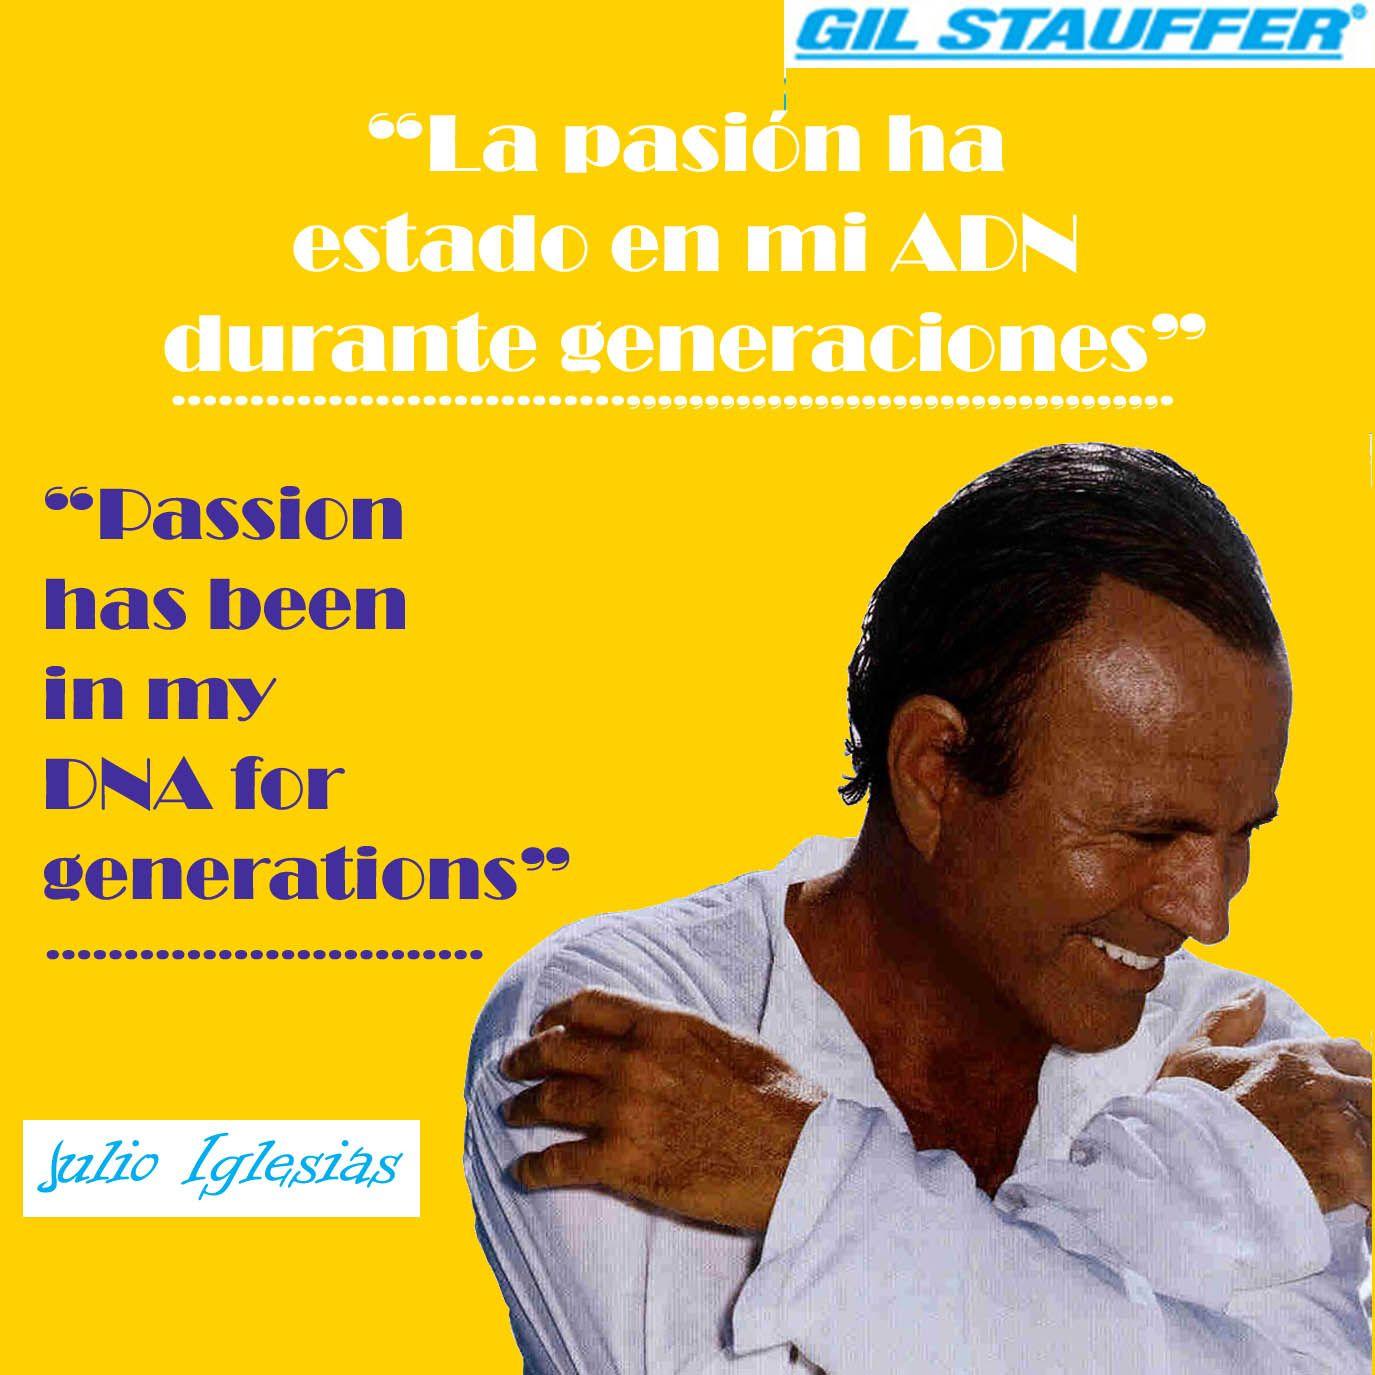 Frase Semanal 50 Diseño De Gil Stauffer Julio Iglesias